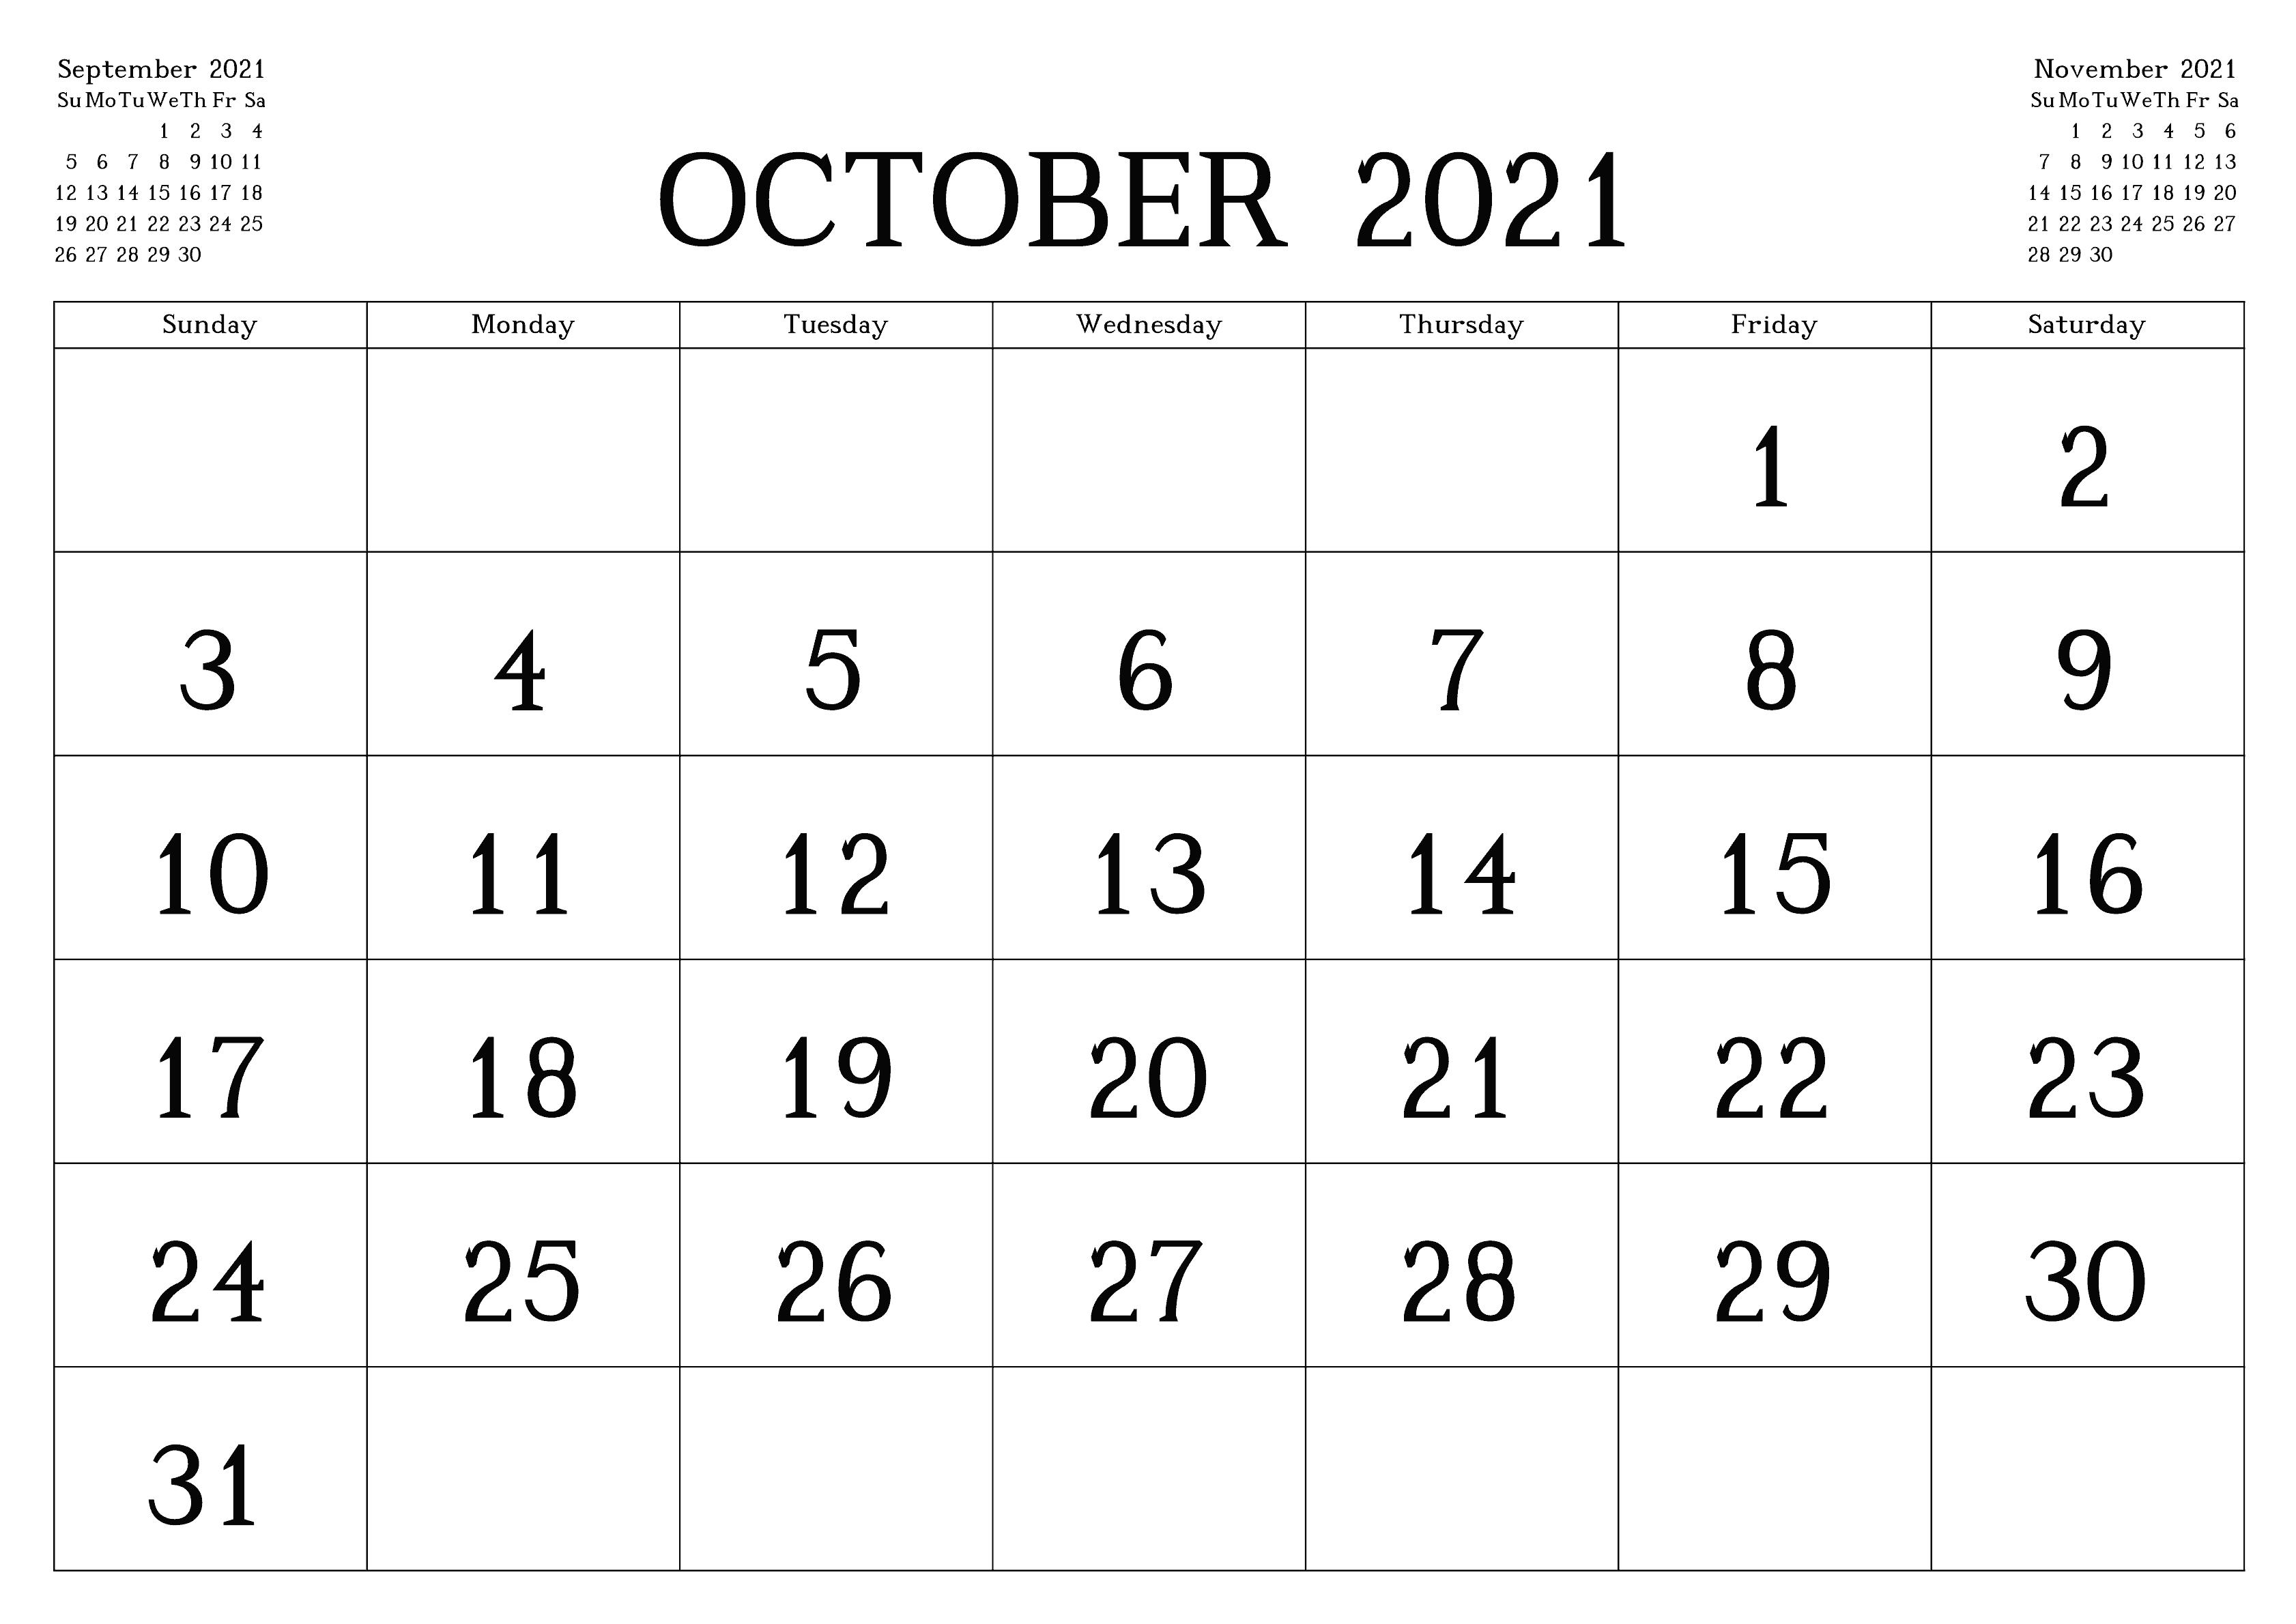 October 2021 Printable Calendar For Students Planner